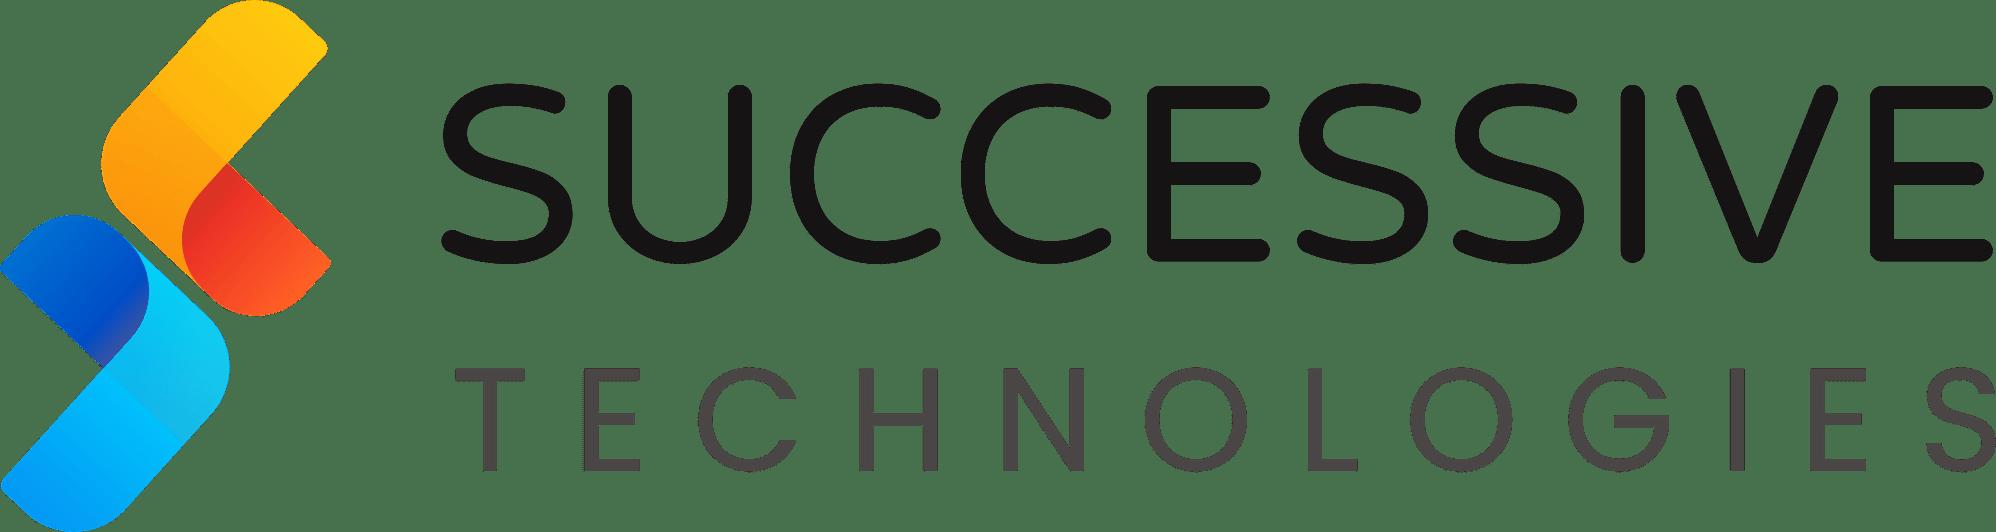 Successive Tech logo